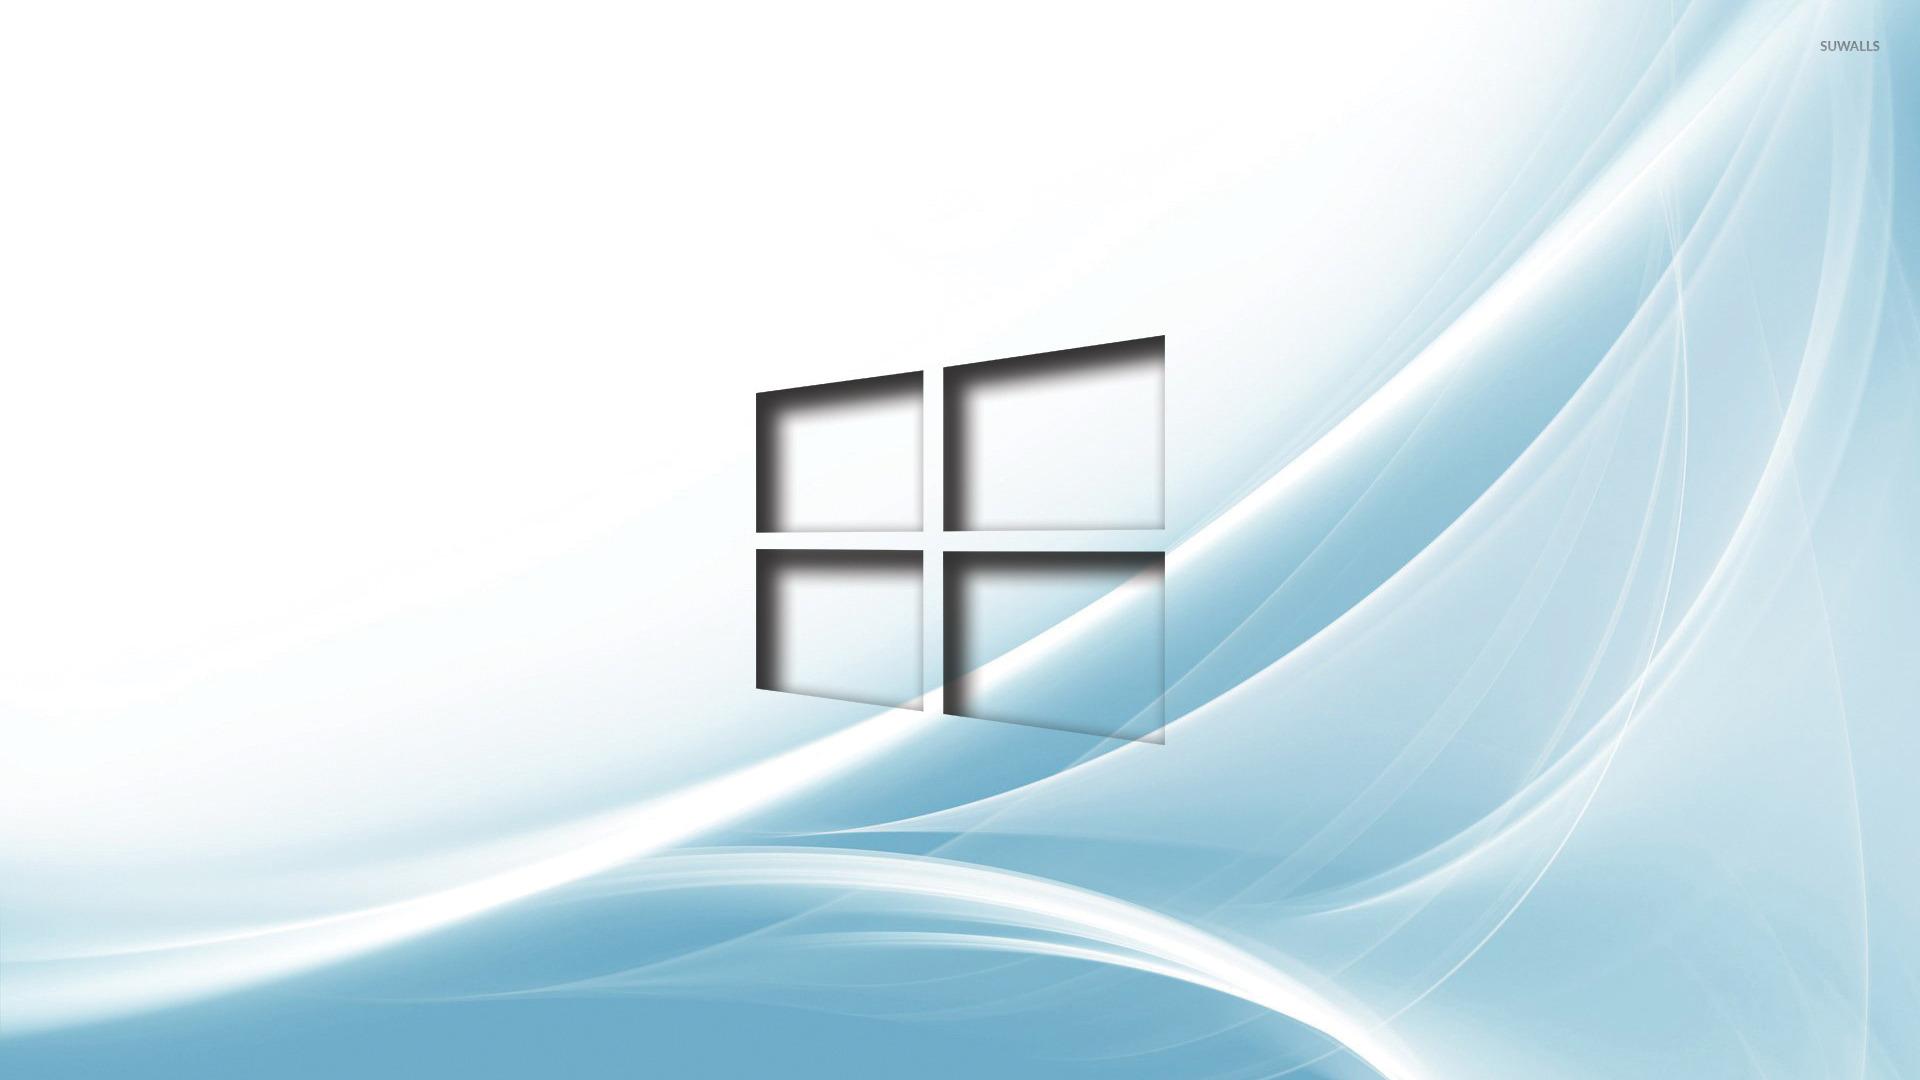 Windows 7 Light Wallpapers